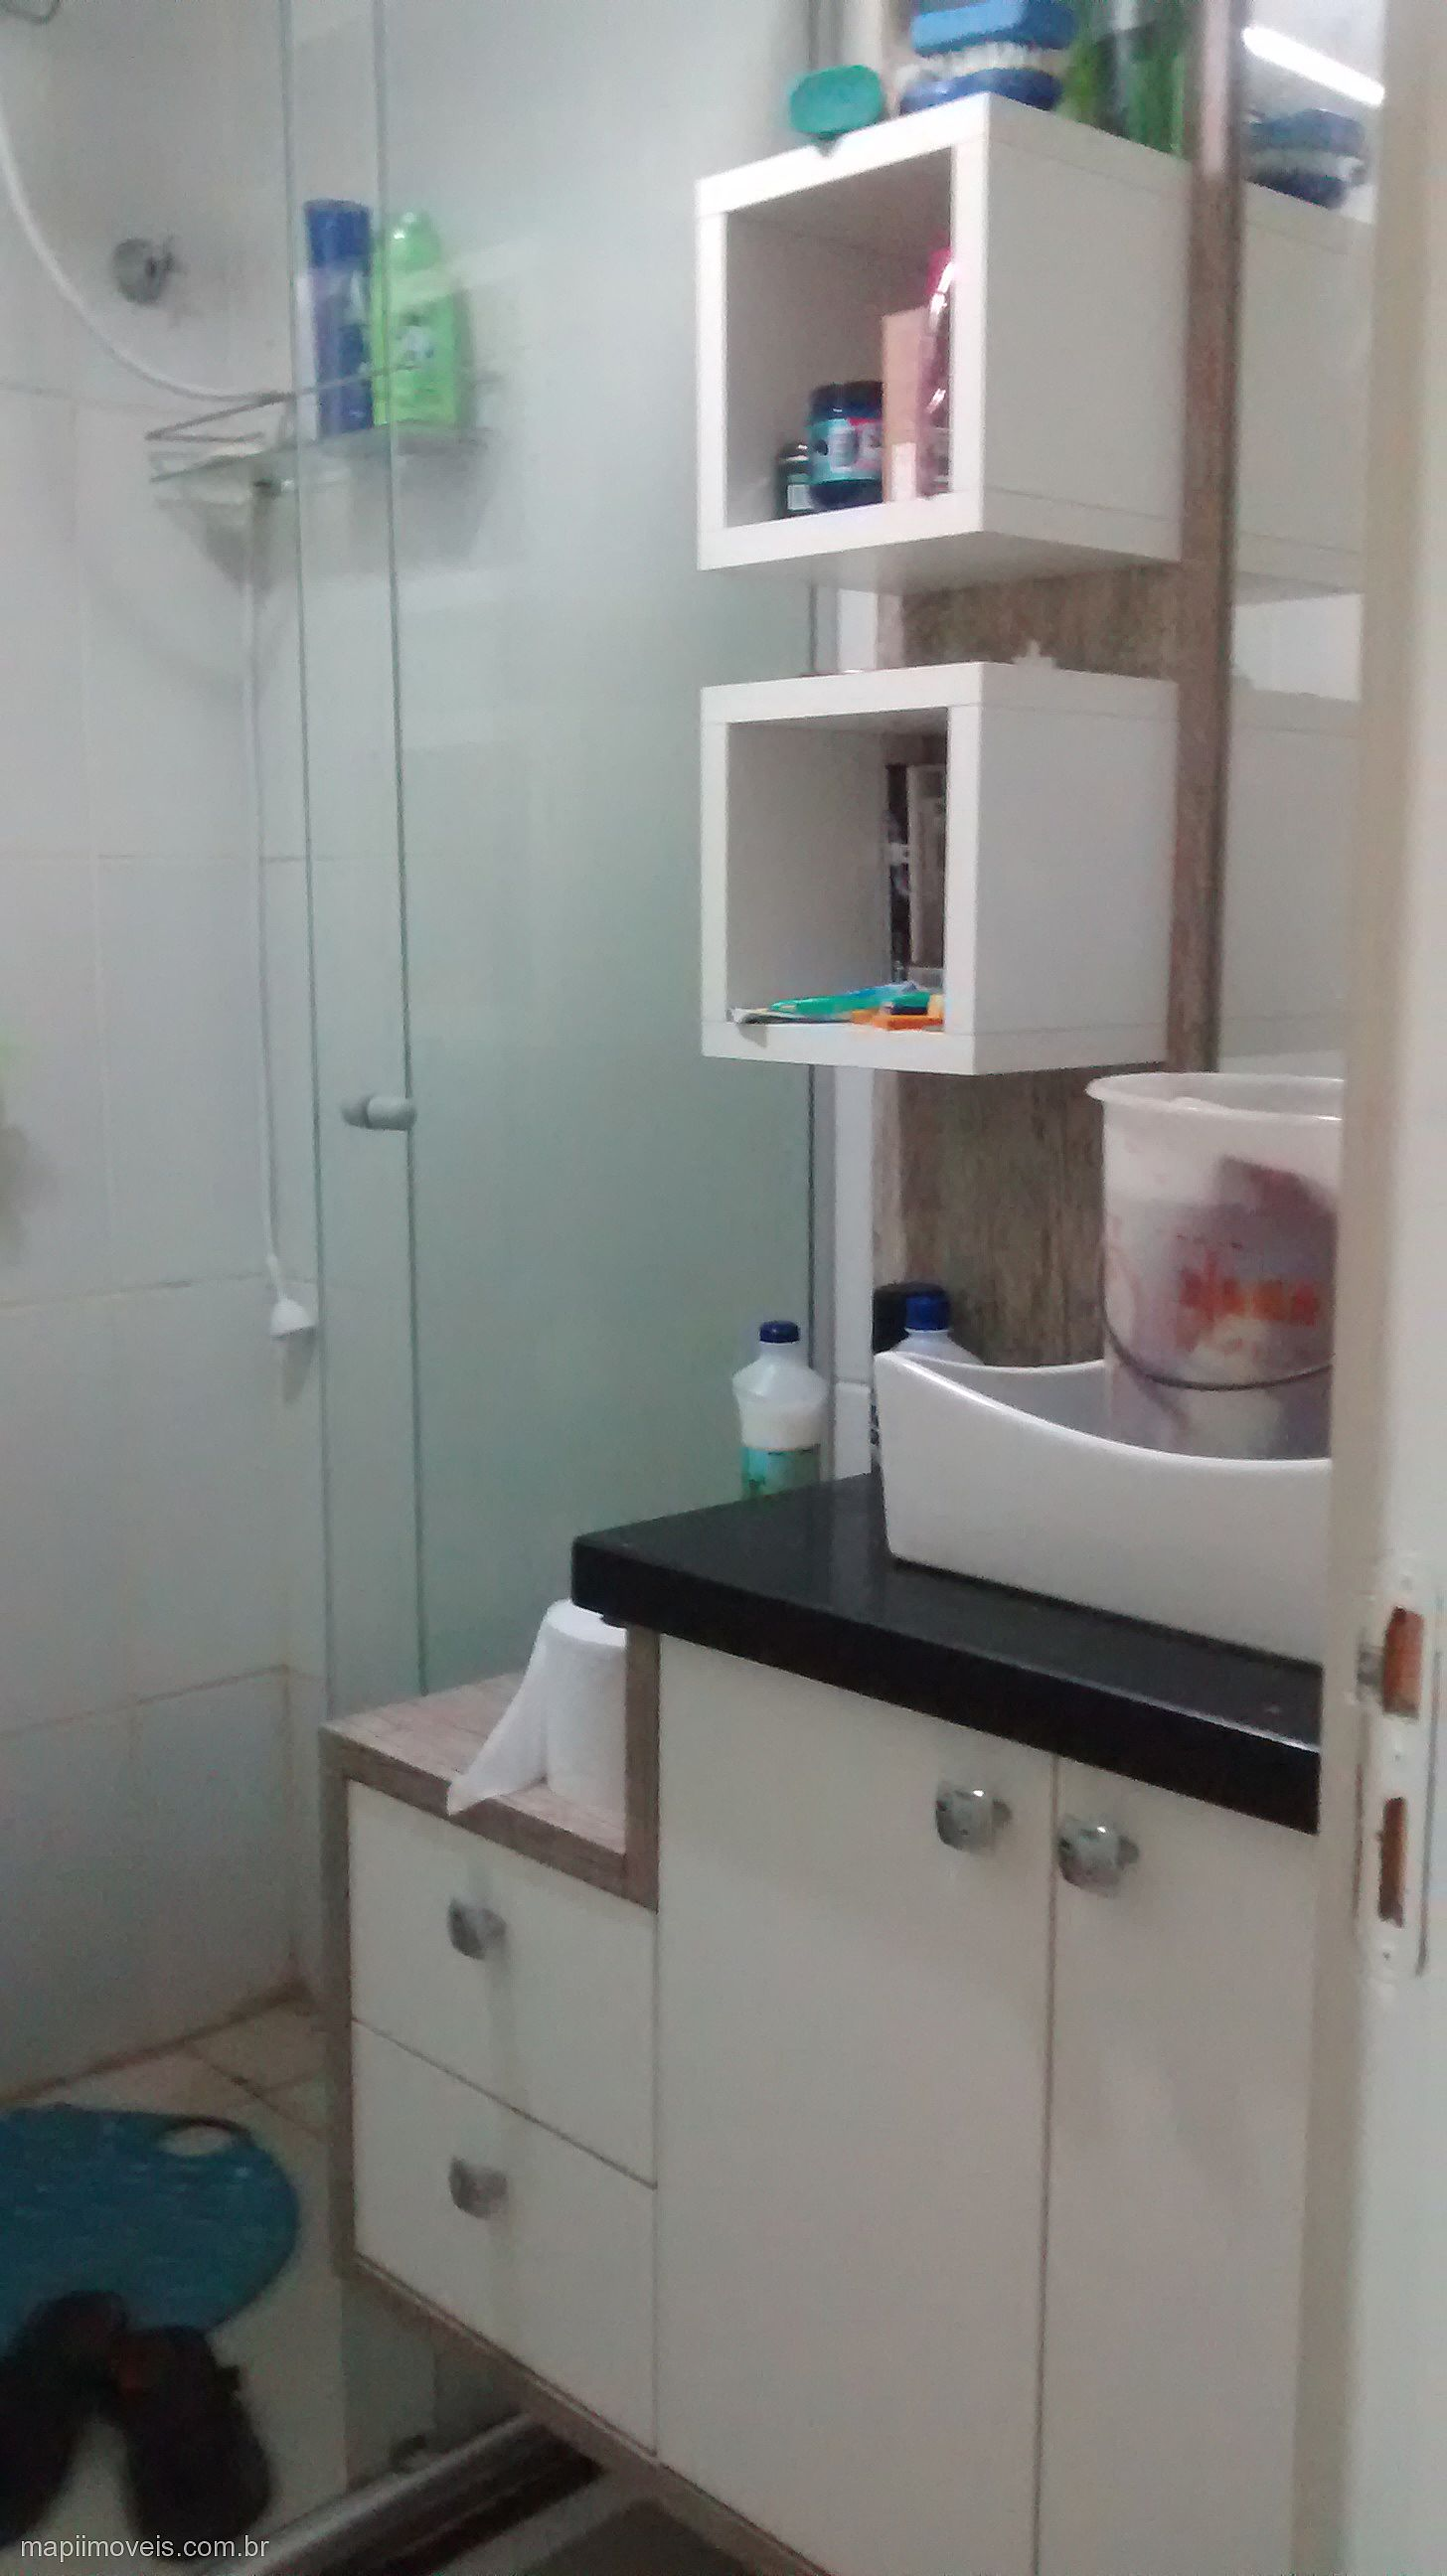 Mapi Imóveis - Apto 3 Dorm, Santos Dumont (284838) - Foto 10